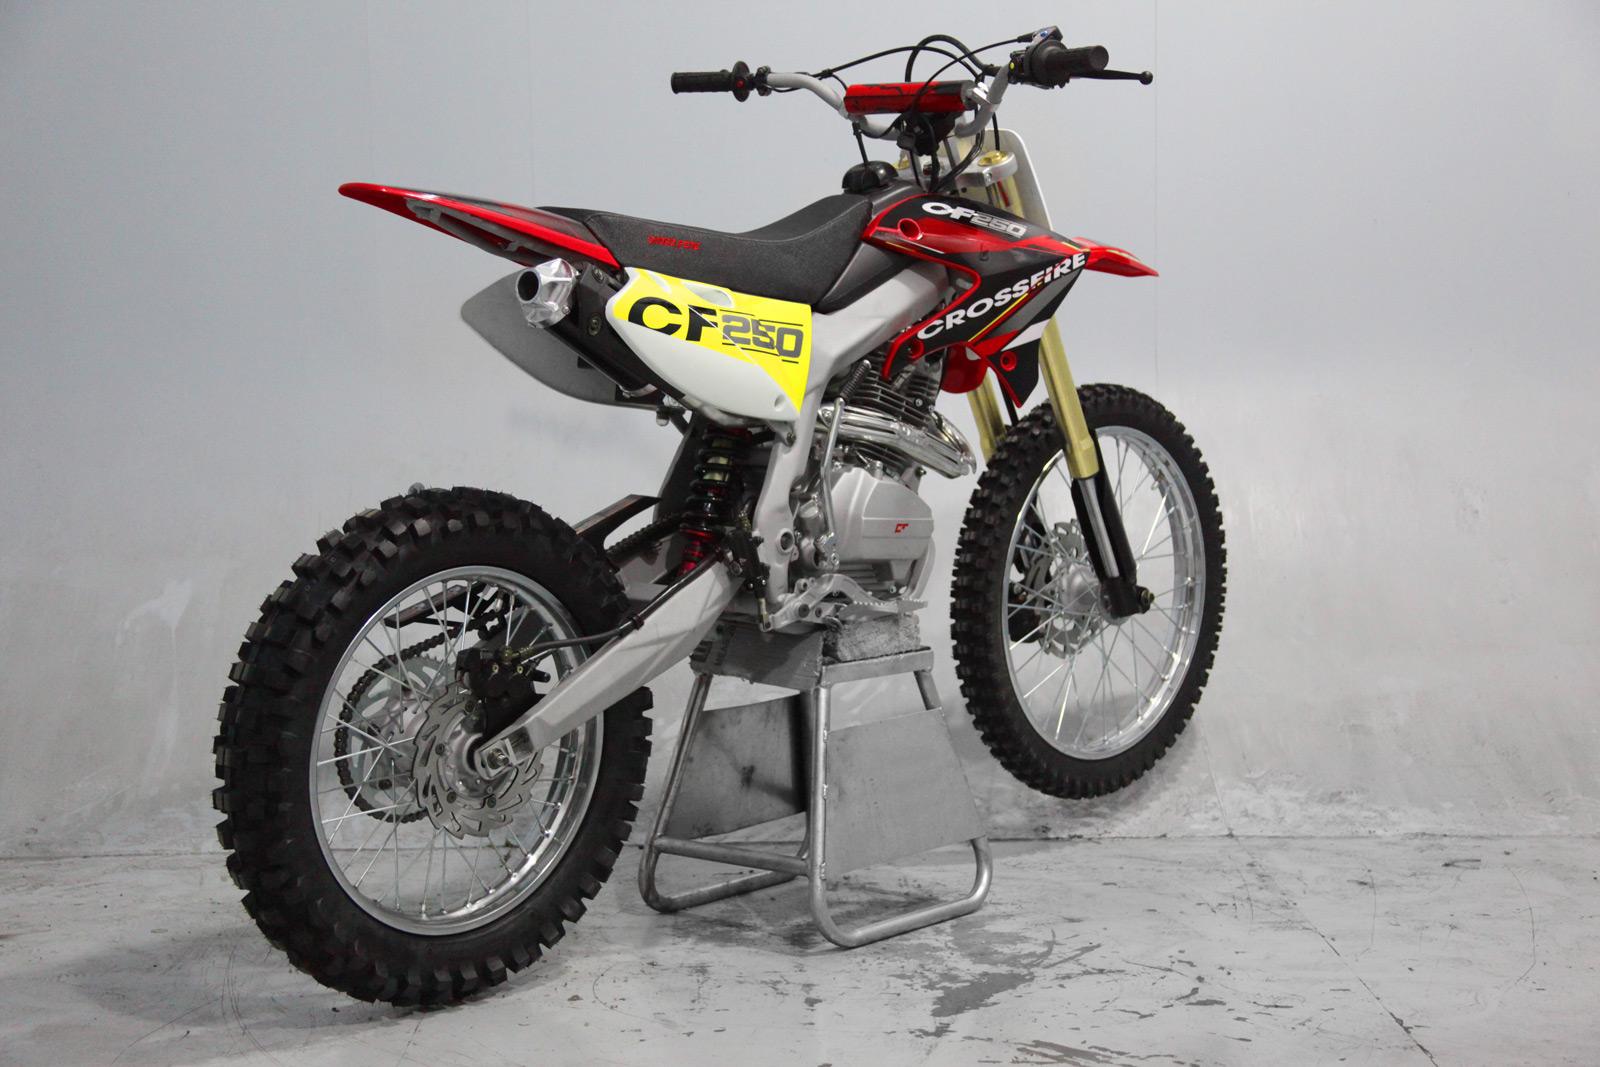 Crossfire Motorcycles - CF250L 250cc Dirt Bike